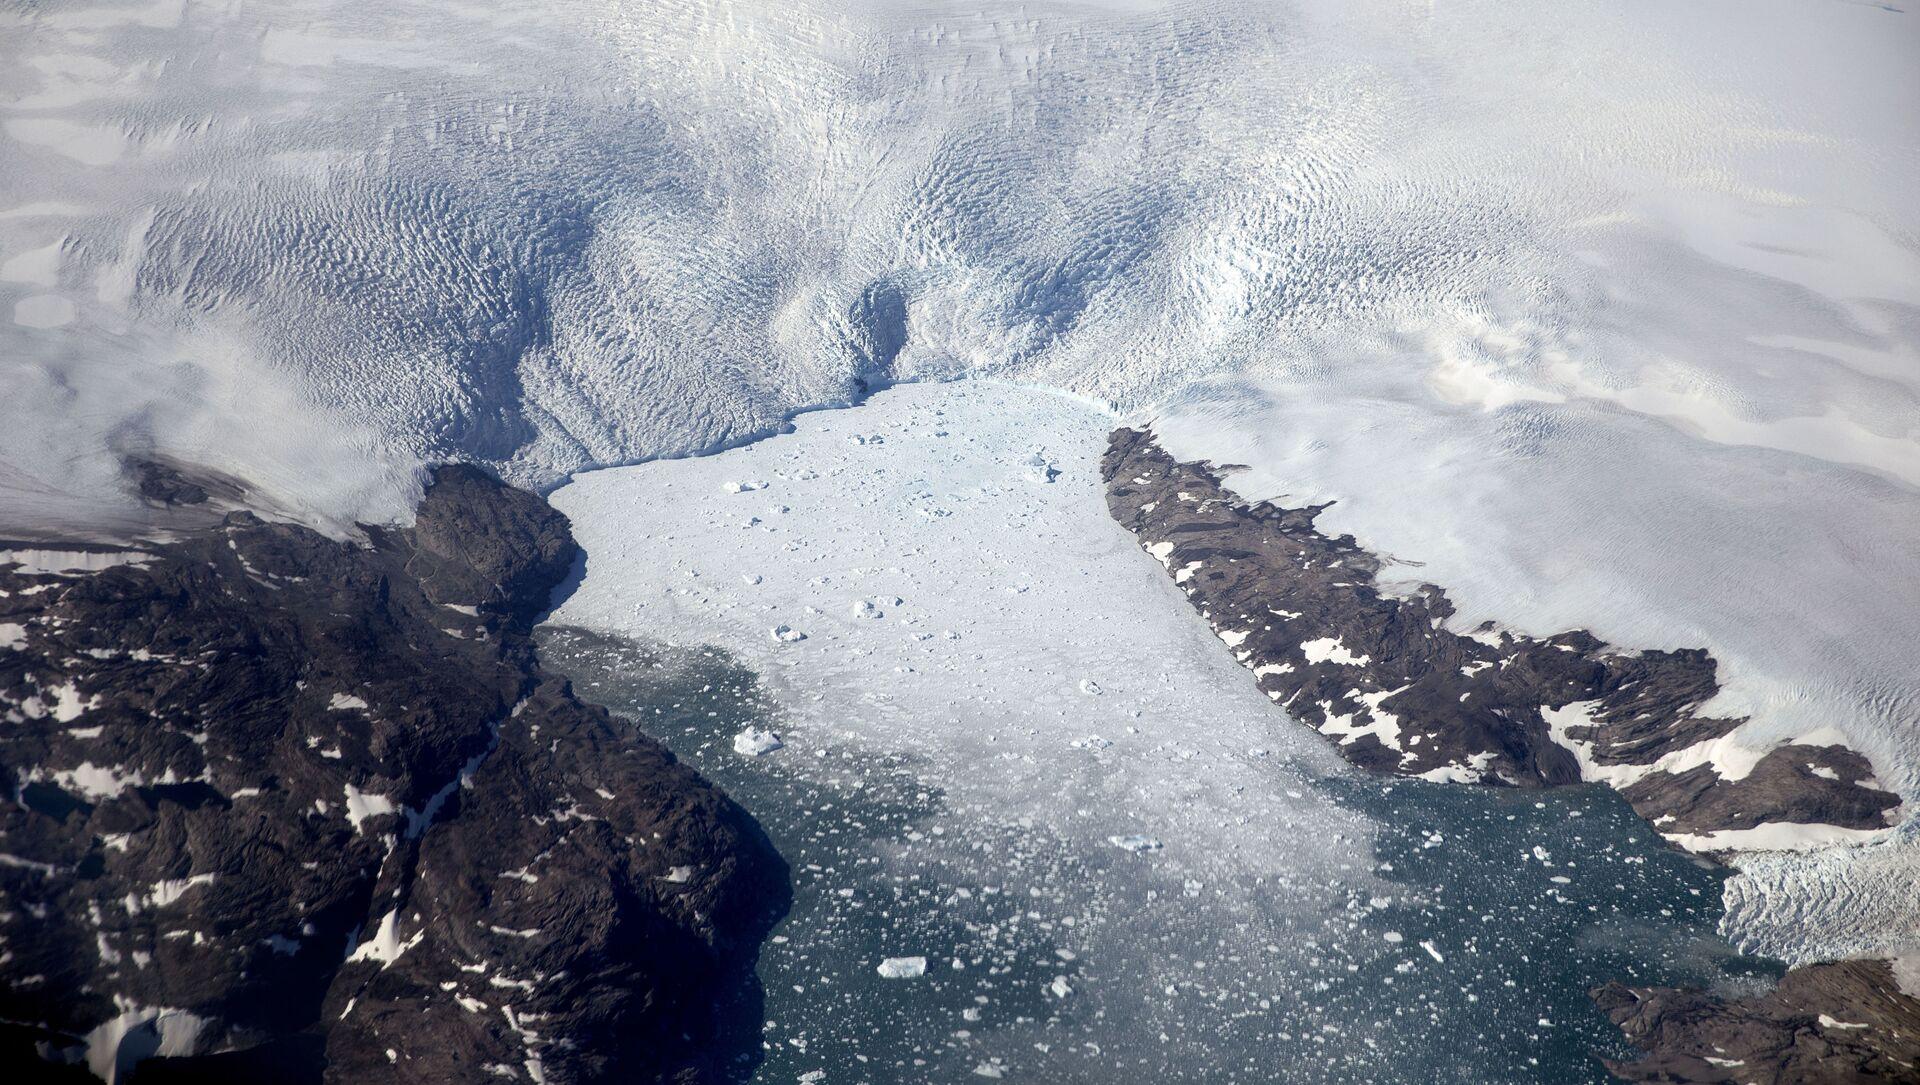 Таяние ледника в Гренландии - Sputnik Azərbaycan, 1920, 28.08.2021